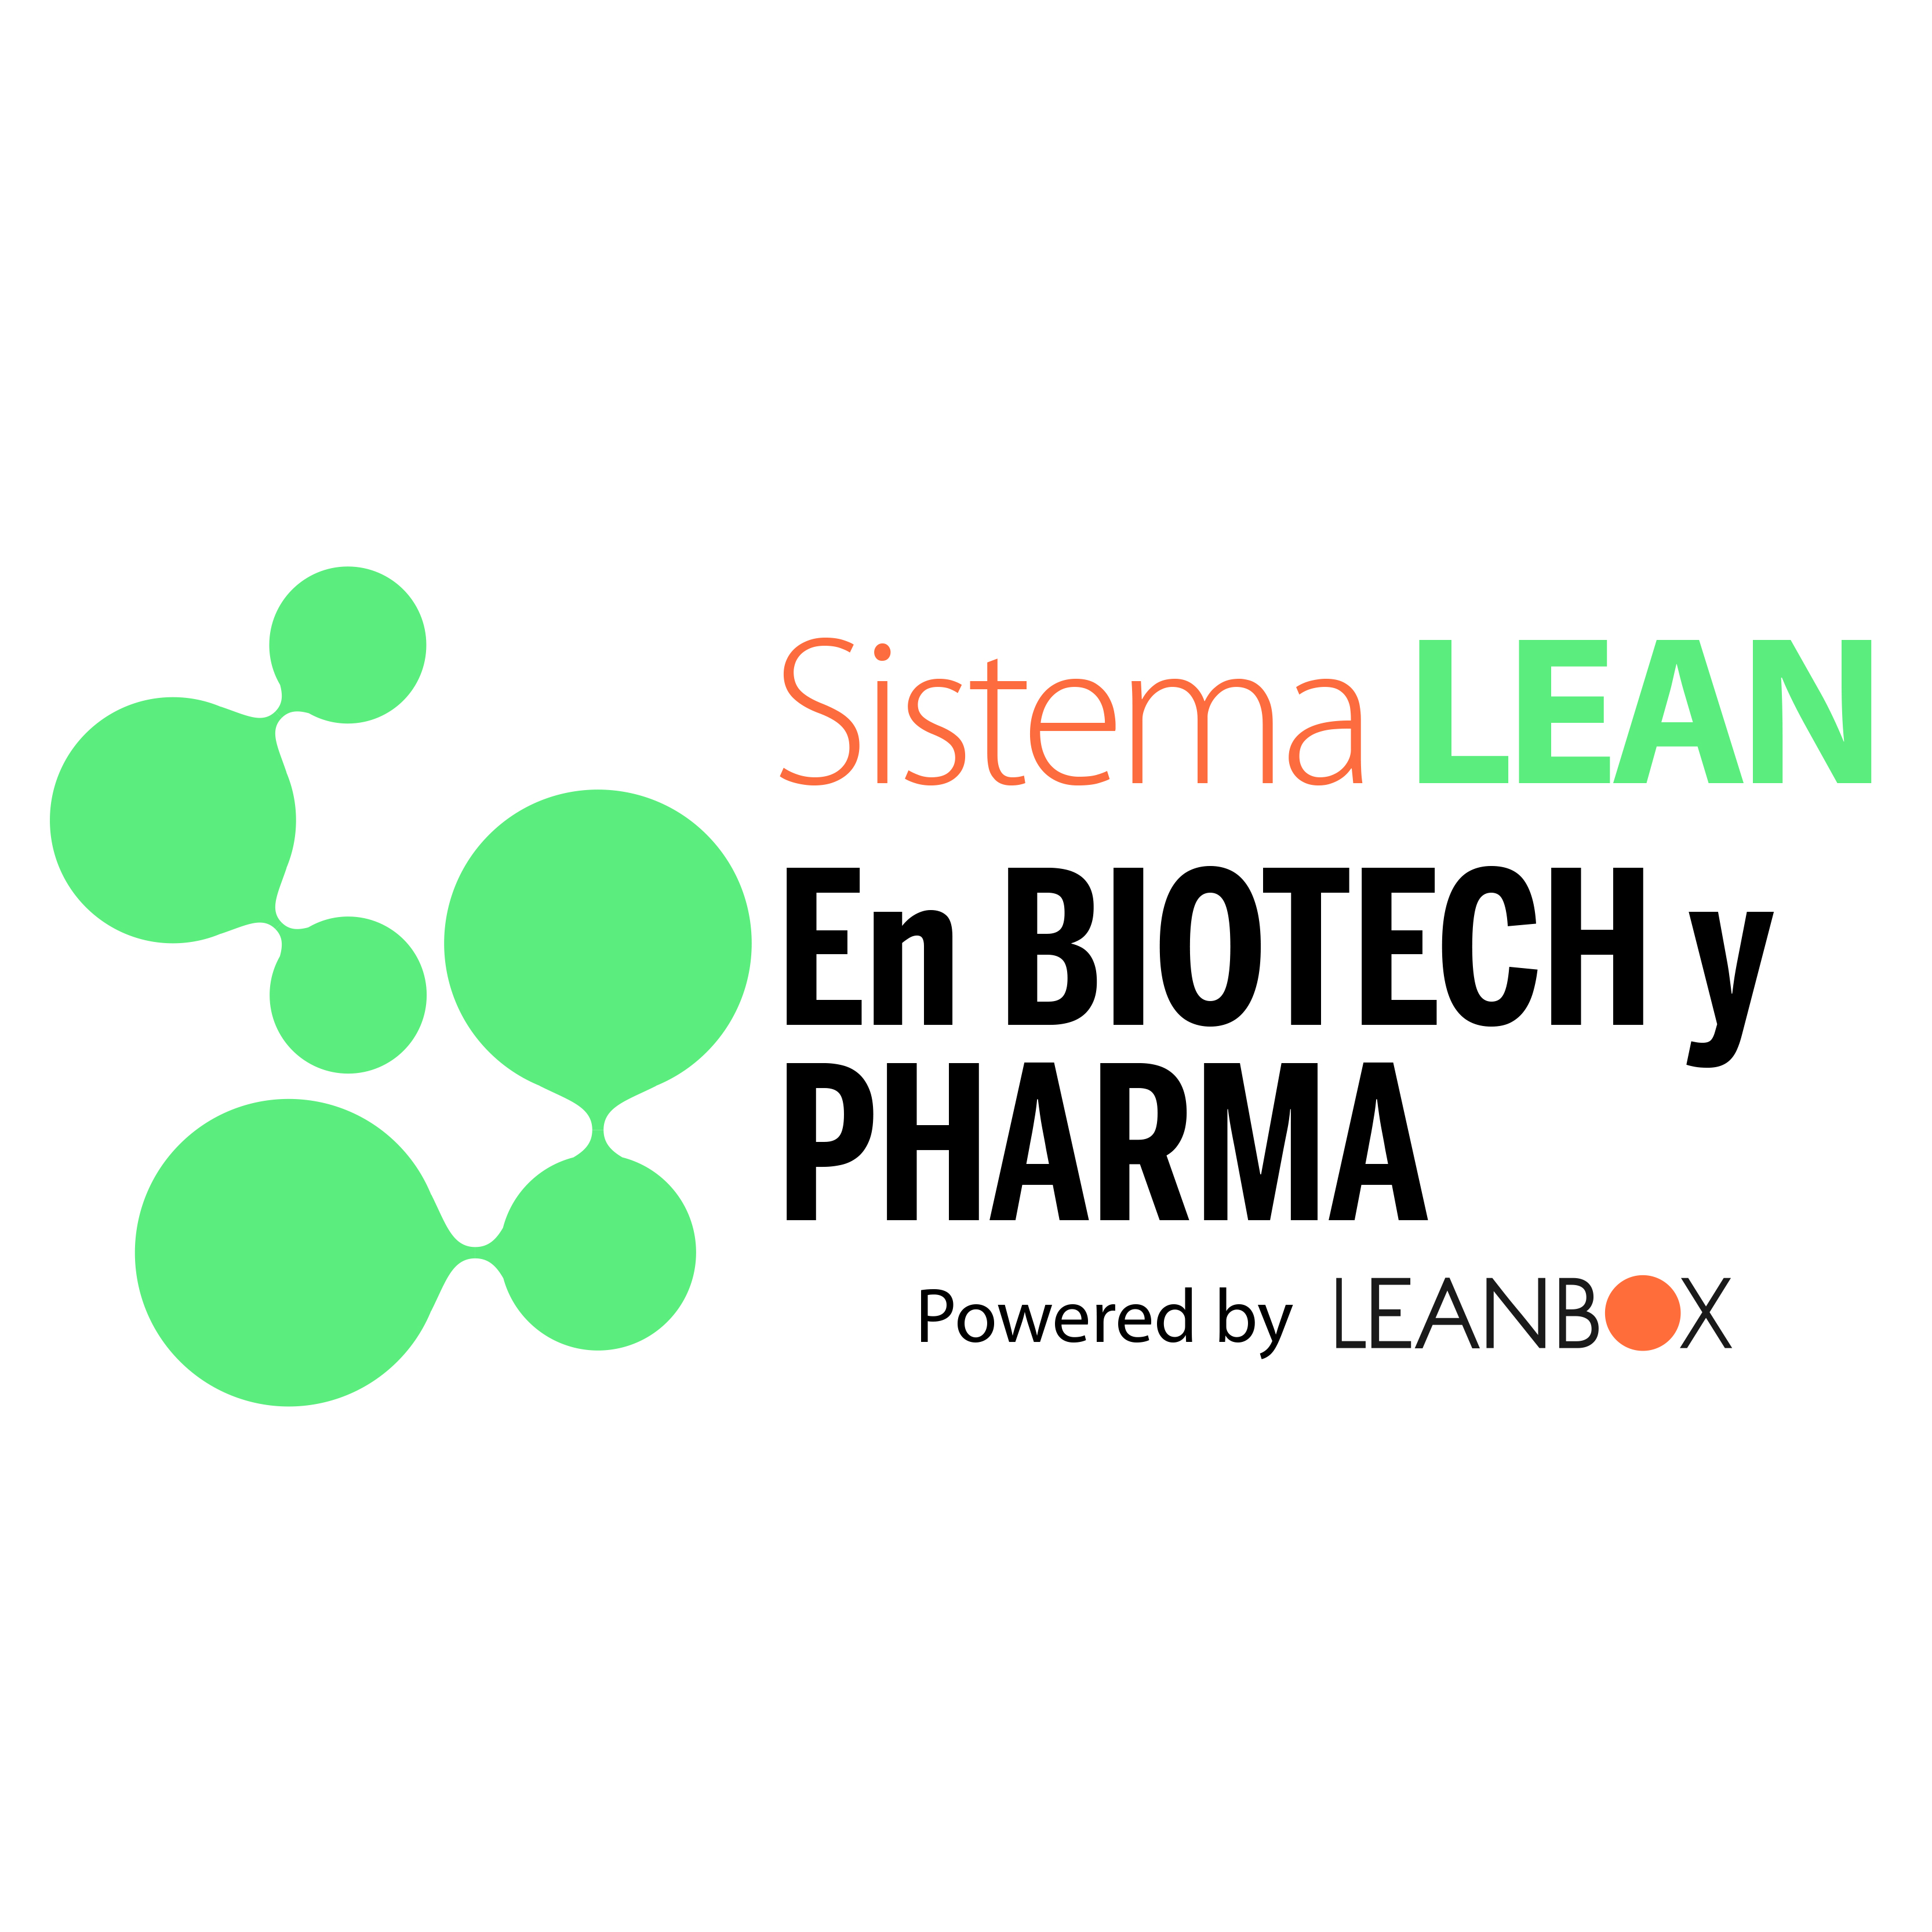 Formacion Lean en Biotech y Pharma Leanbox